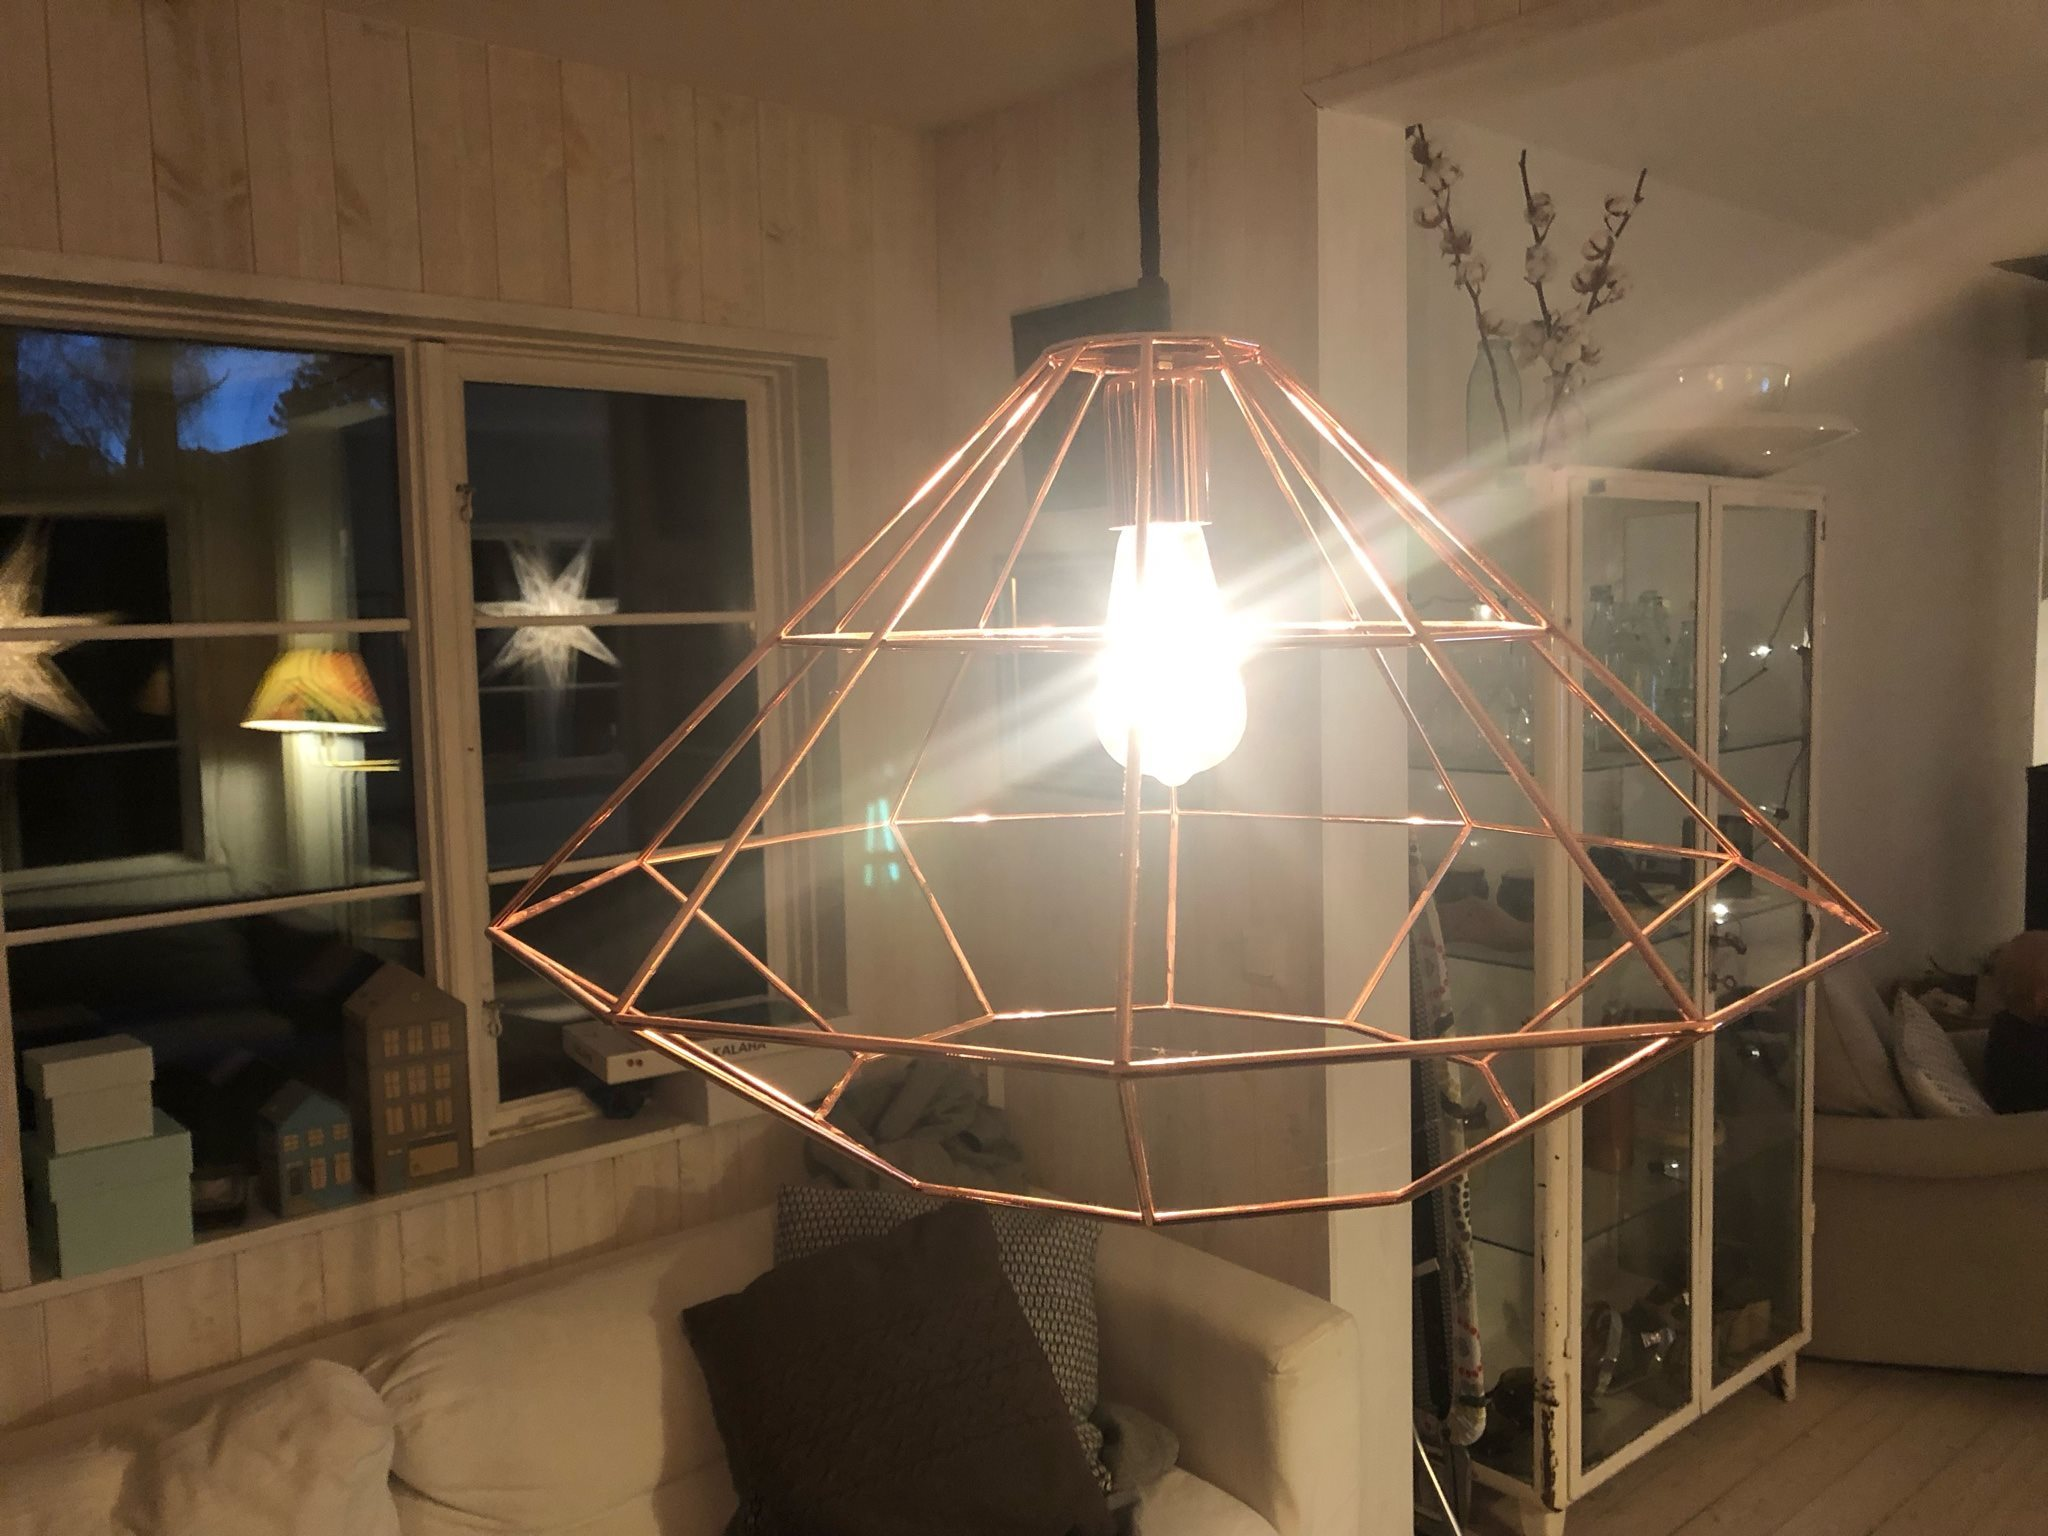 1 lampa från bloomingville. Kopparfärgad Kopparfärgad Kopparfärgad 243cdc